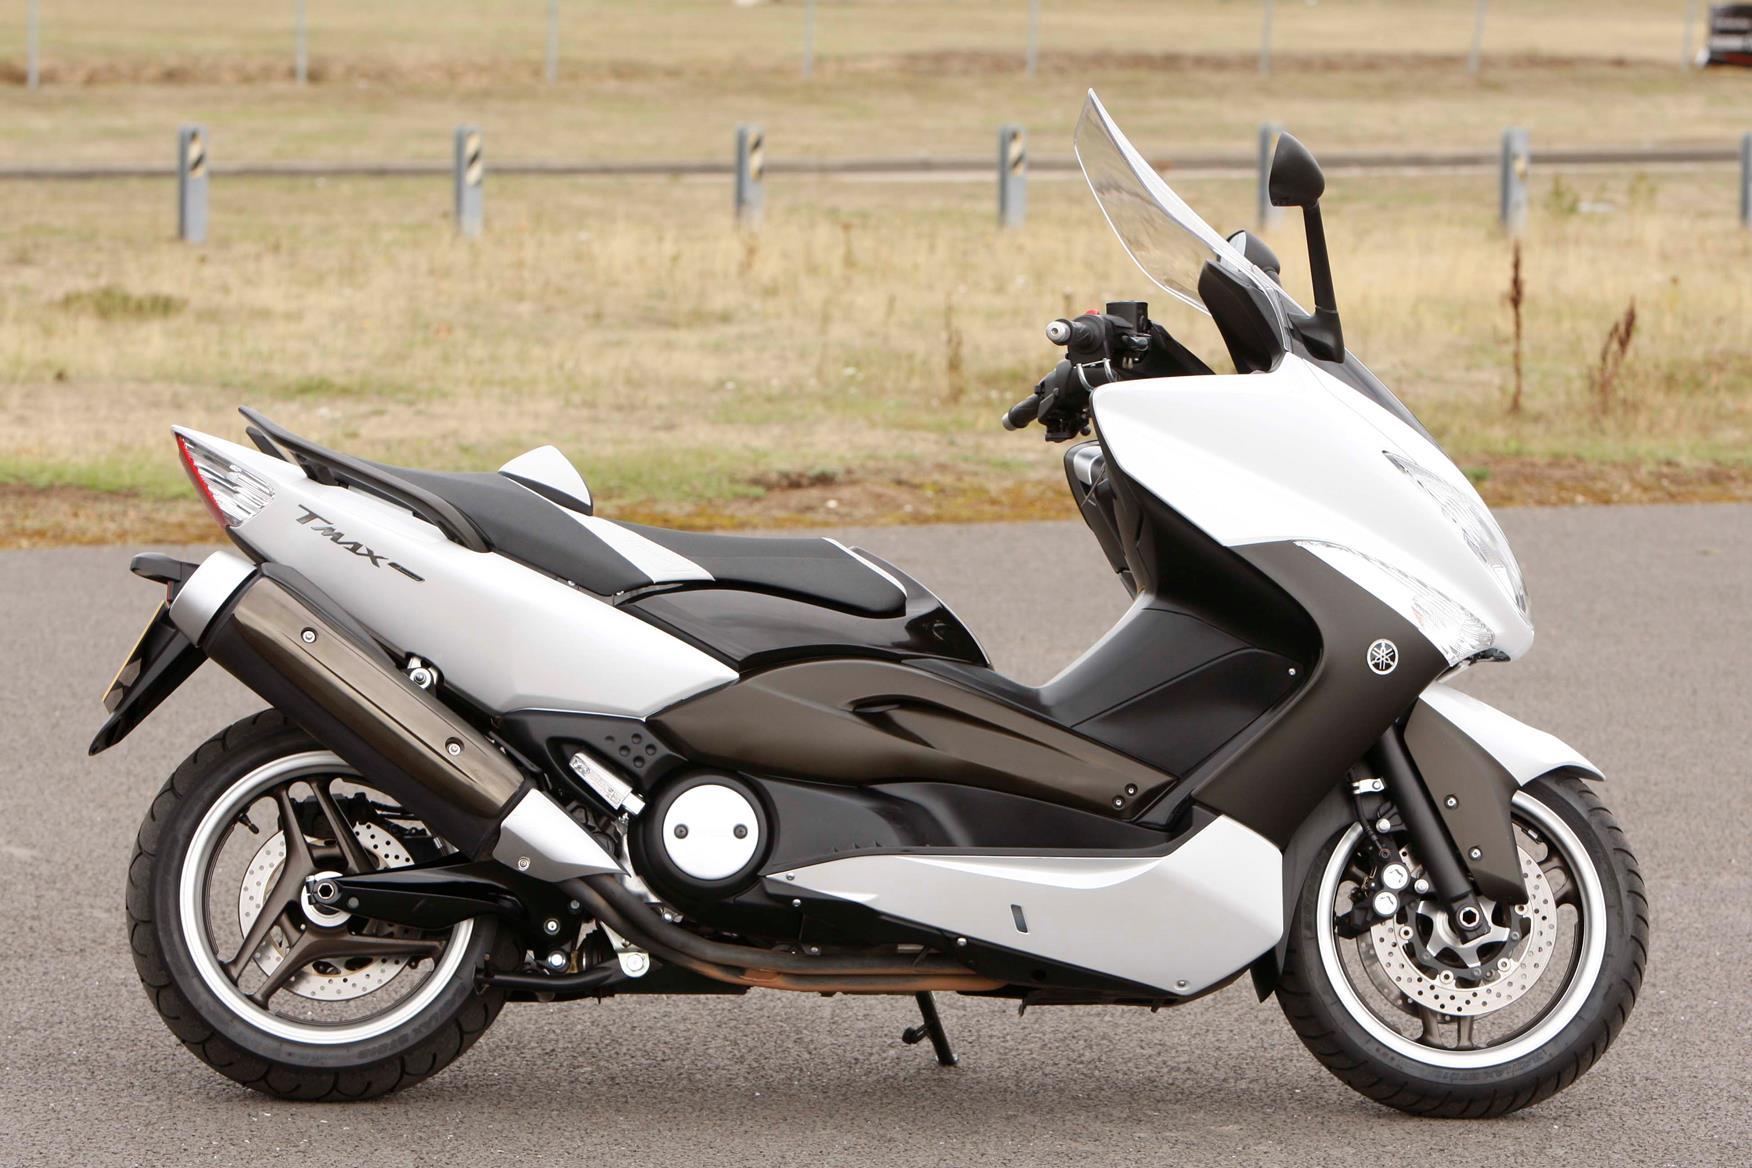 motorcycle insurance bargains yamaha t max. Black Bedroom Furniture Sets. Home Design Ideas